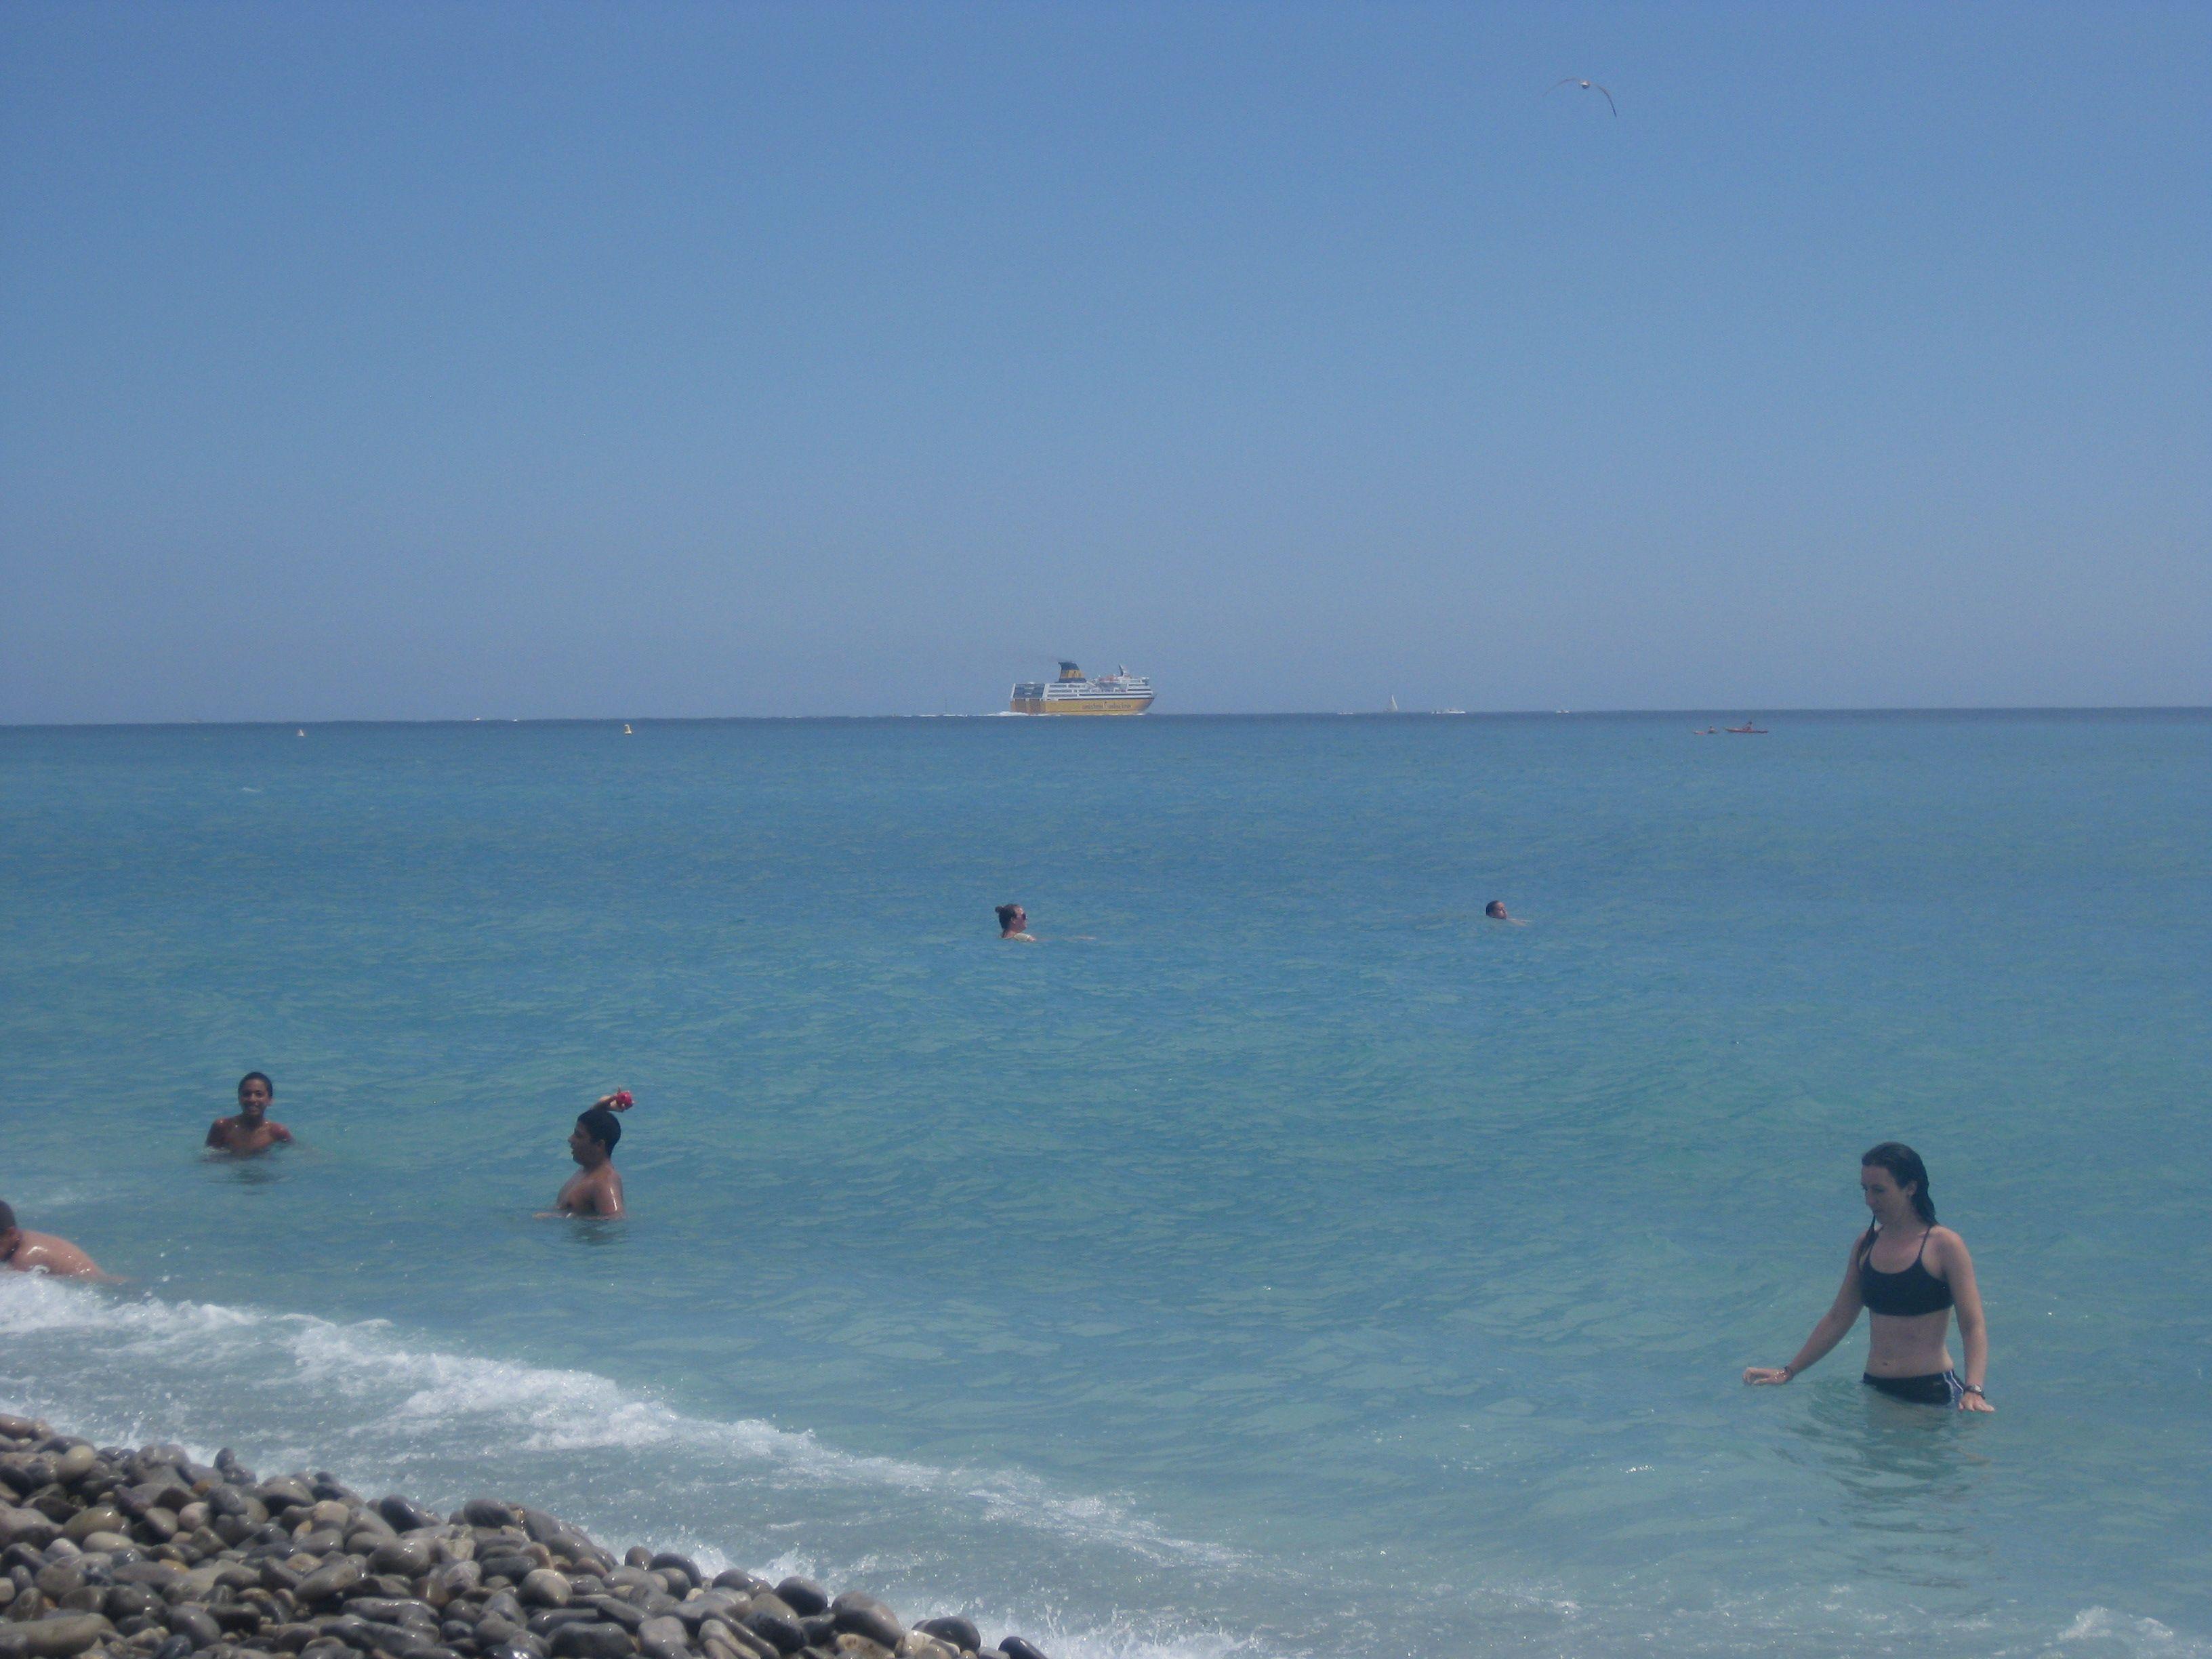 Bright blue skies over Nice